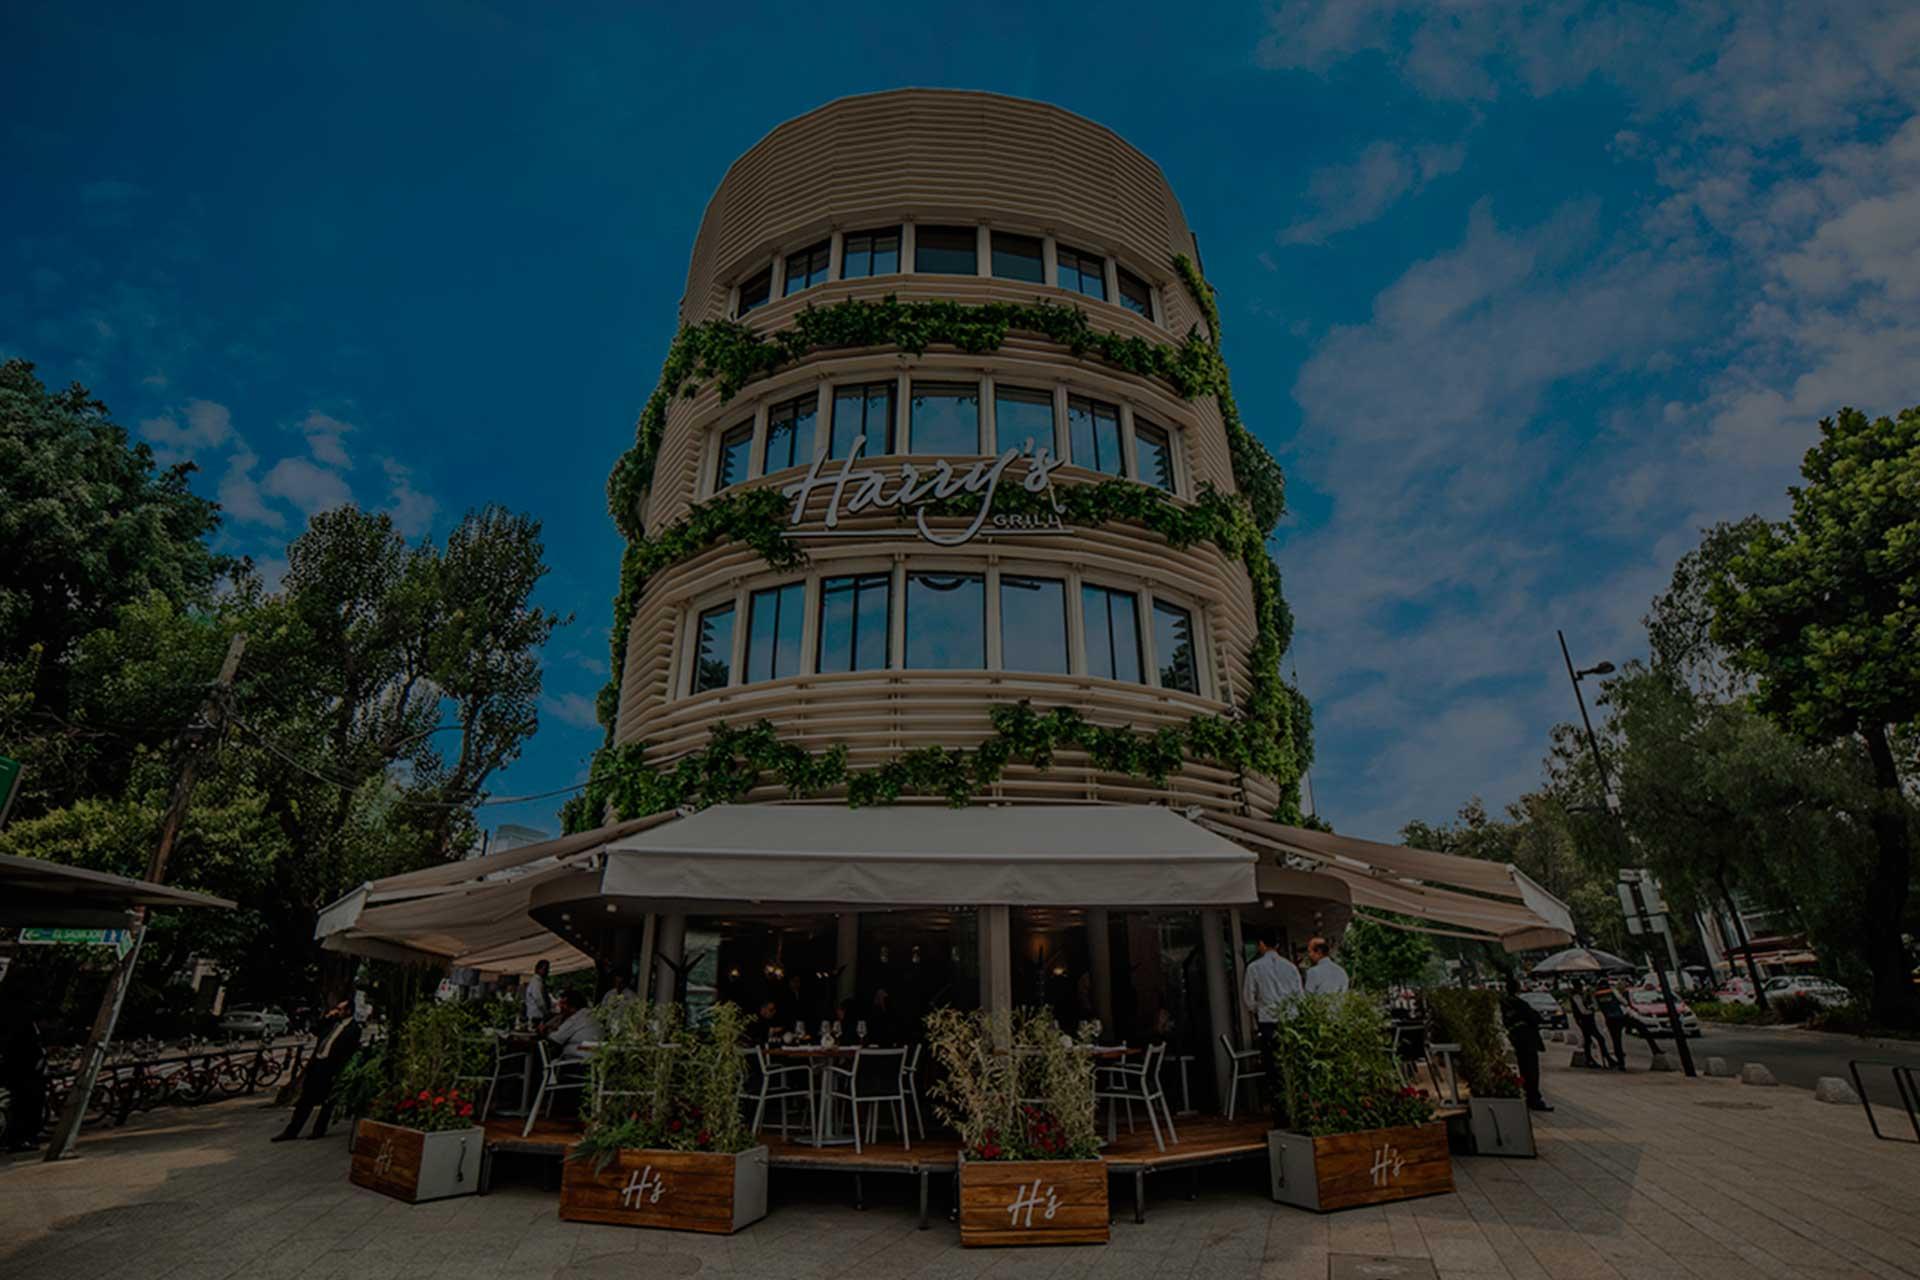 harrys masaryk restaurante prime